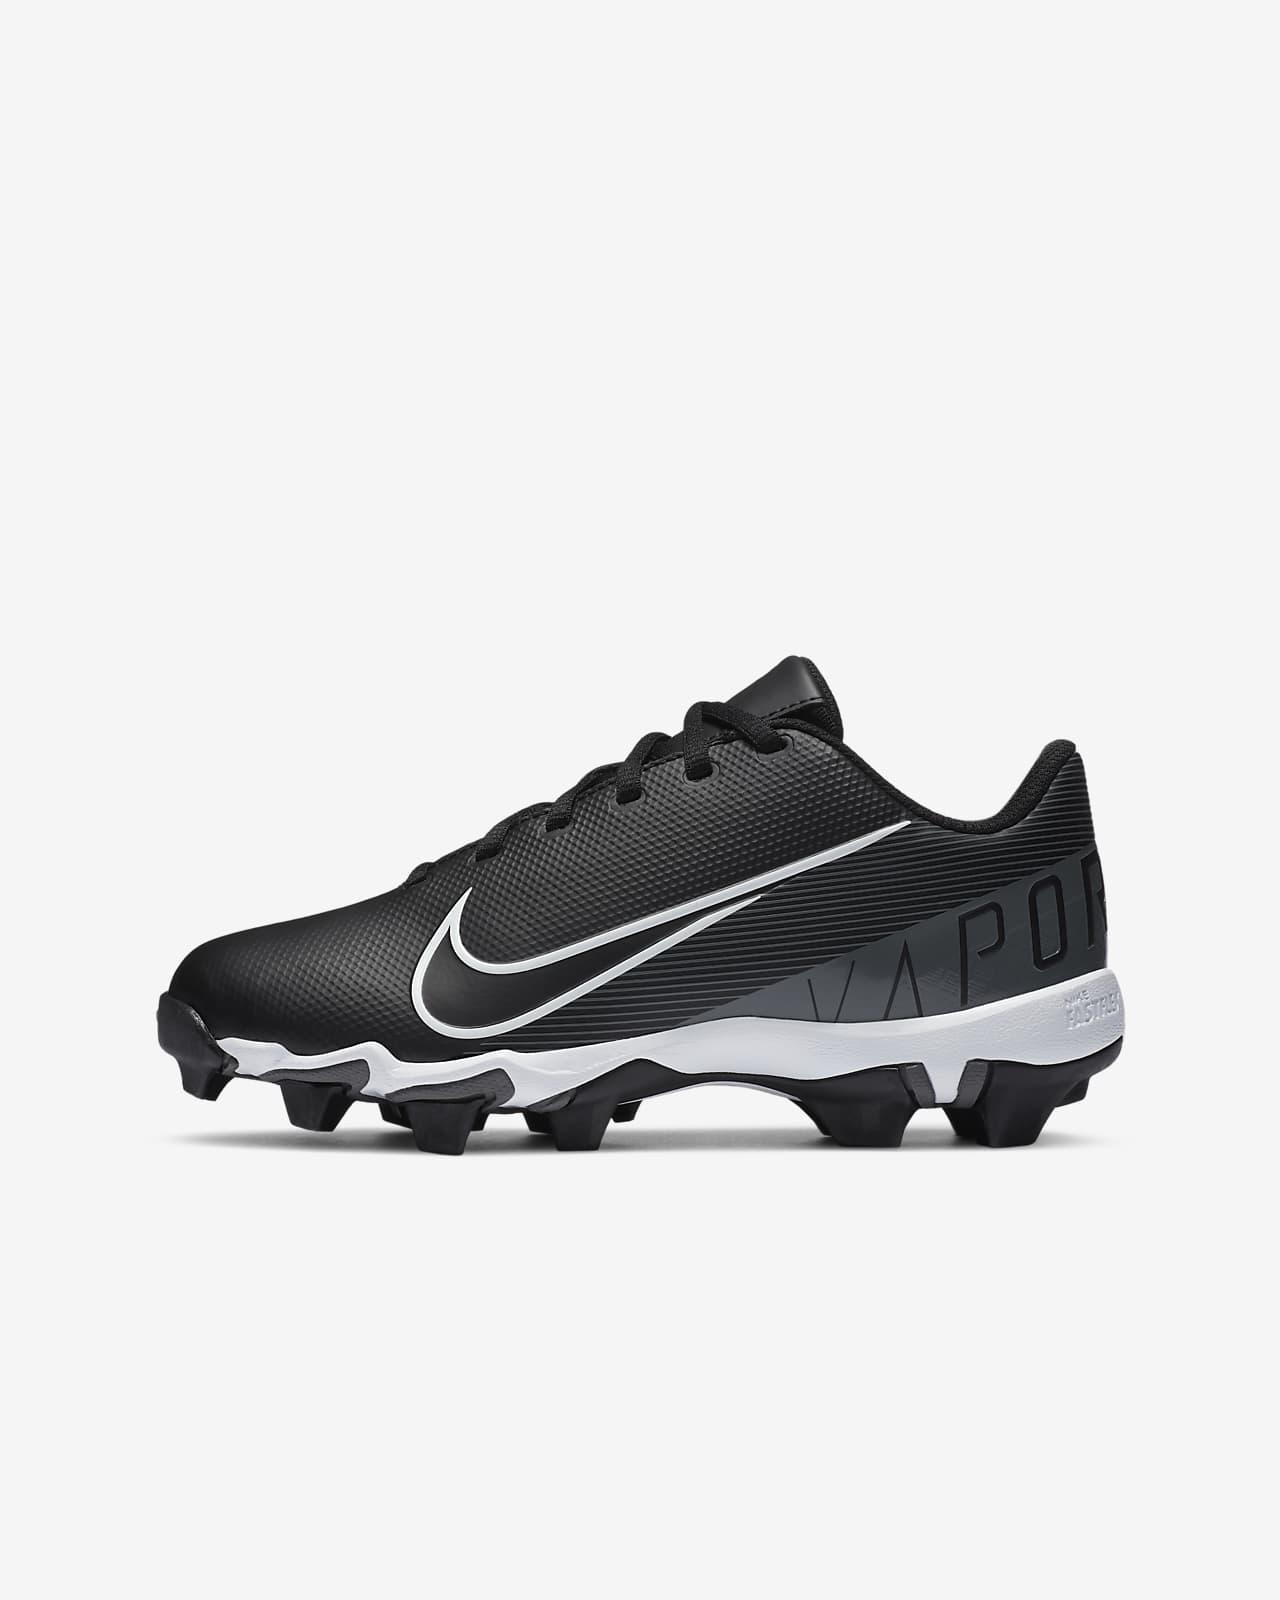 Nike Vapor Ultrafly 3 Keystone Big Kids' Baseball Cleat